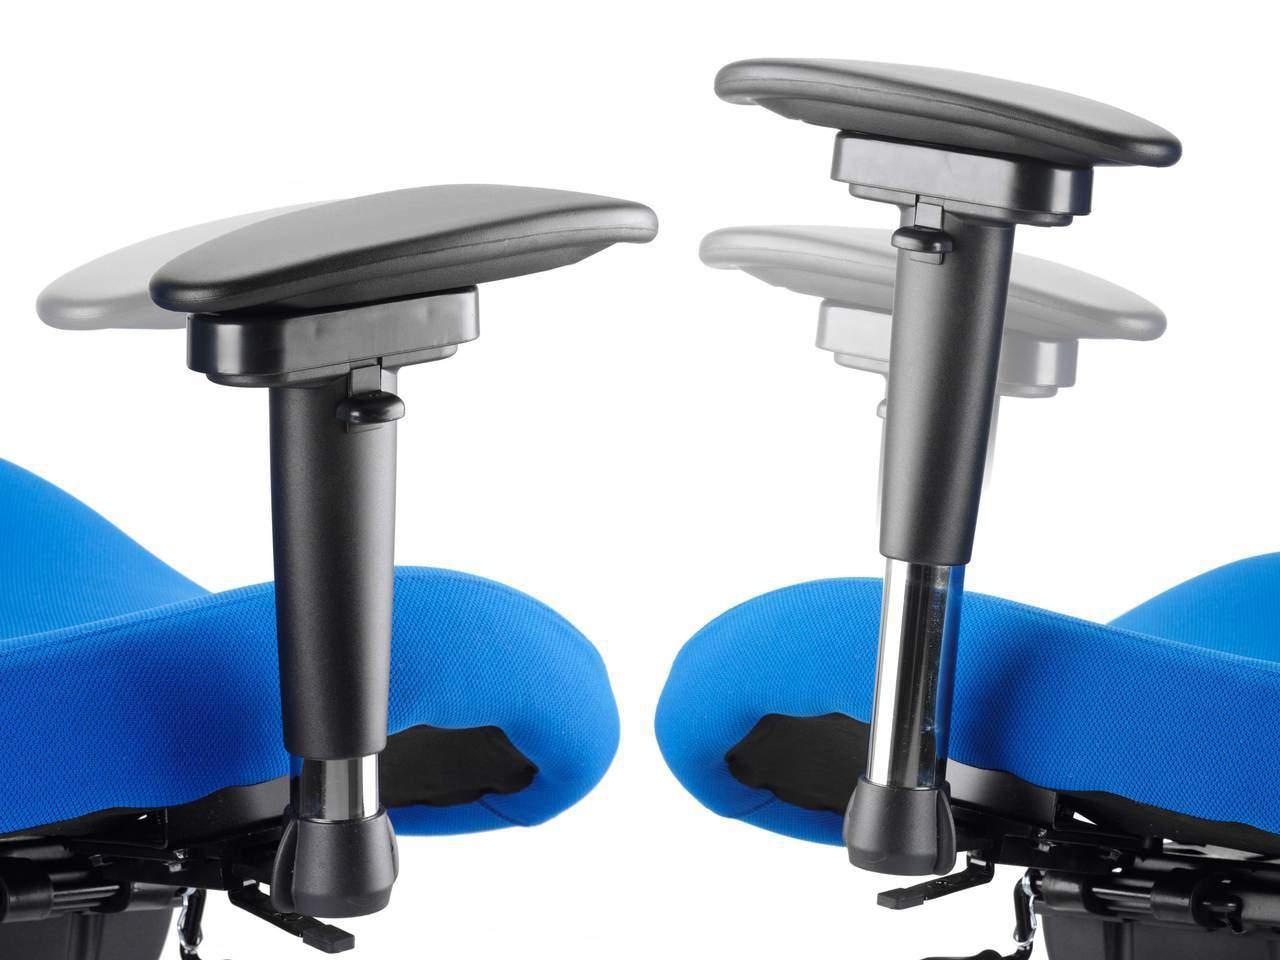 posture monitoring chair banquet cap covers chiro plus 24 hour ergonomic office